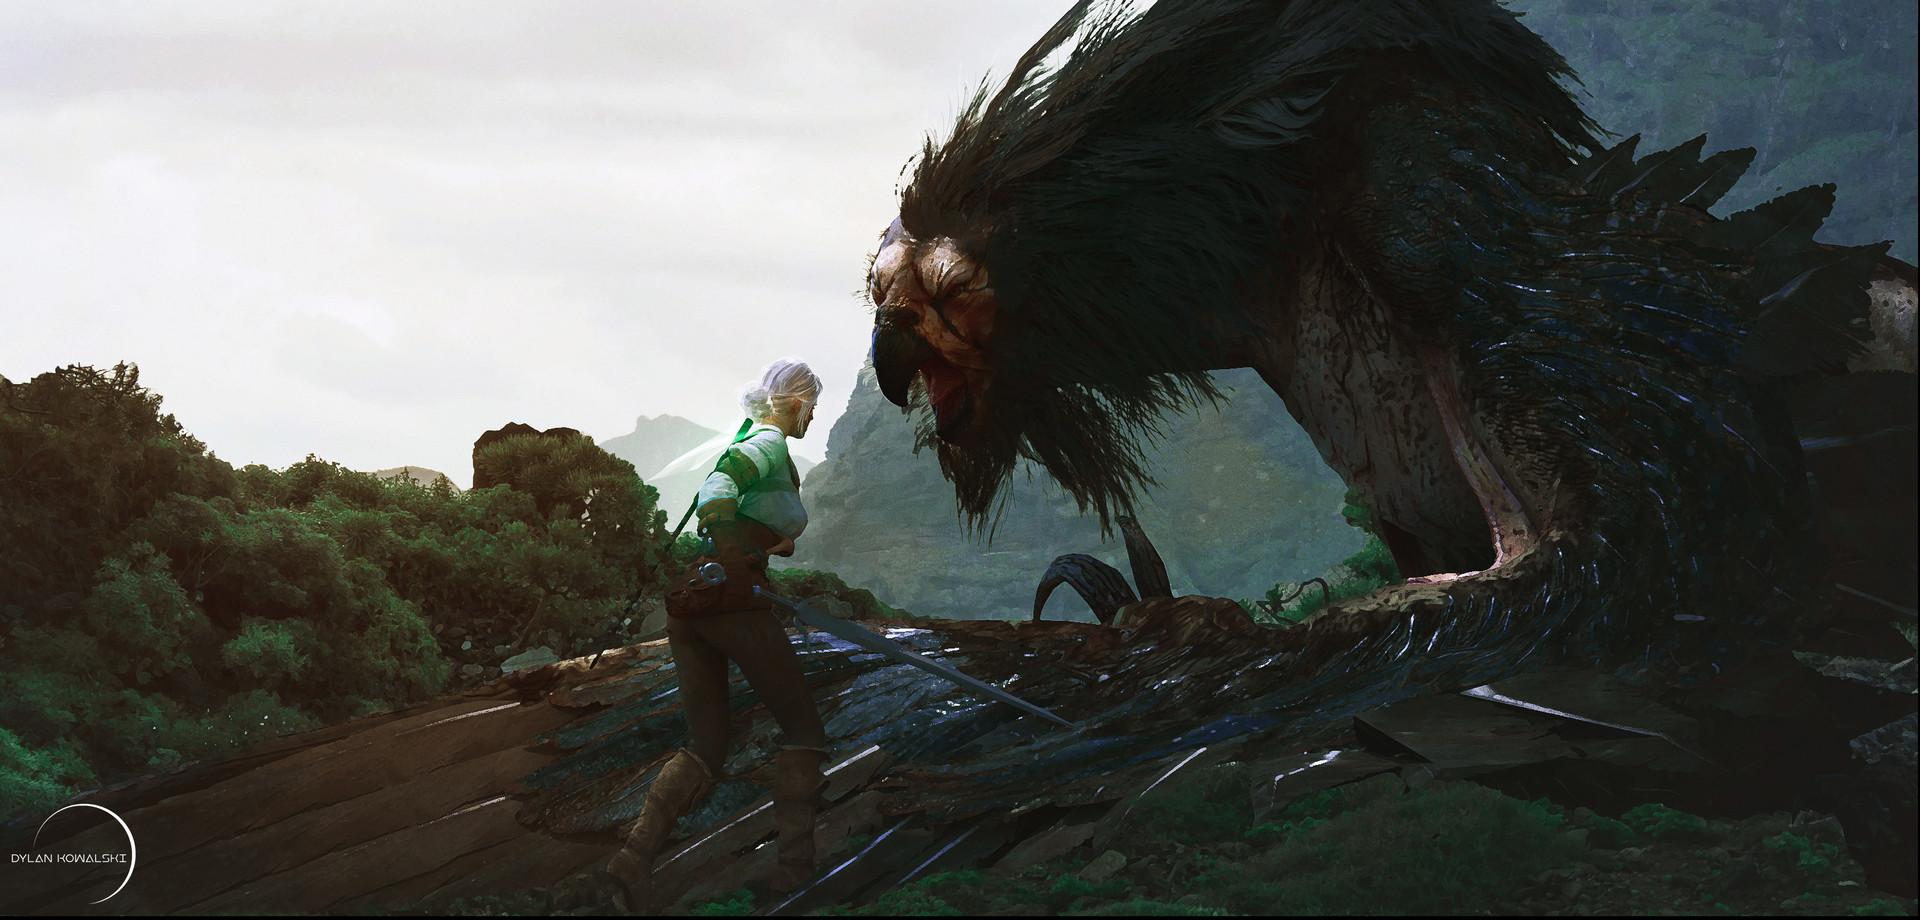 ciri-redesign - The Witcher 3: Wild Hunt